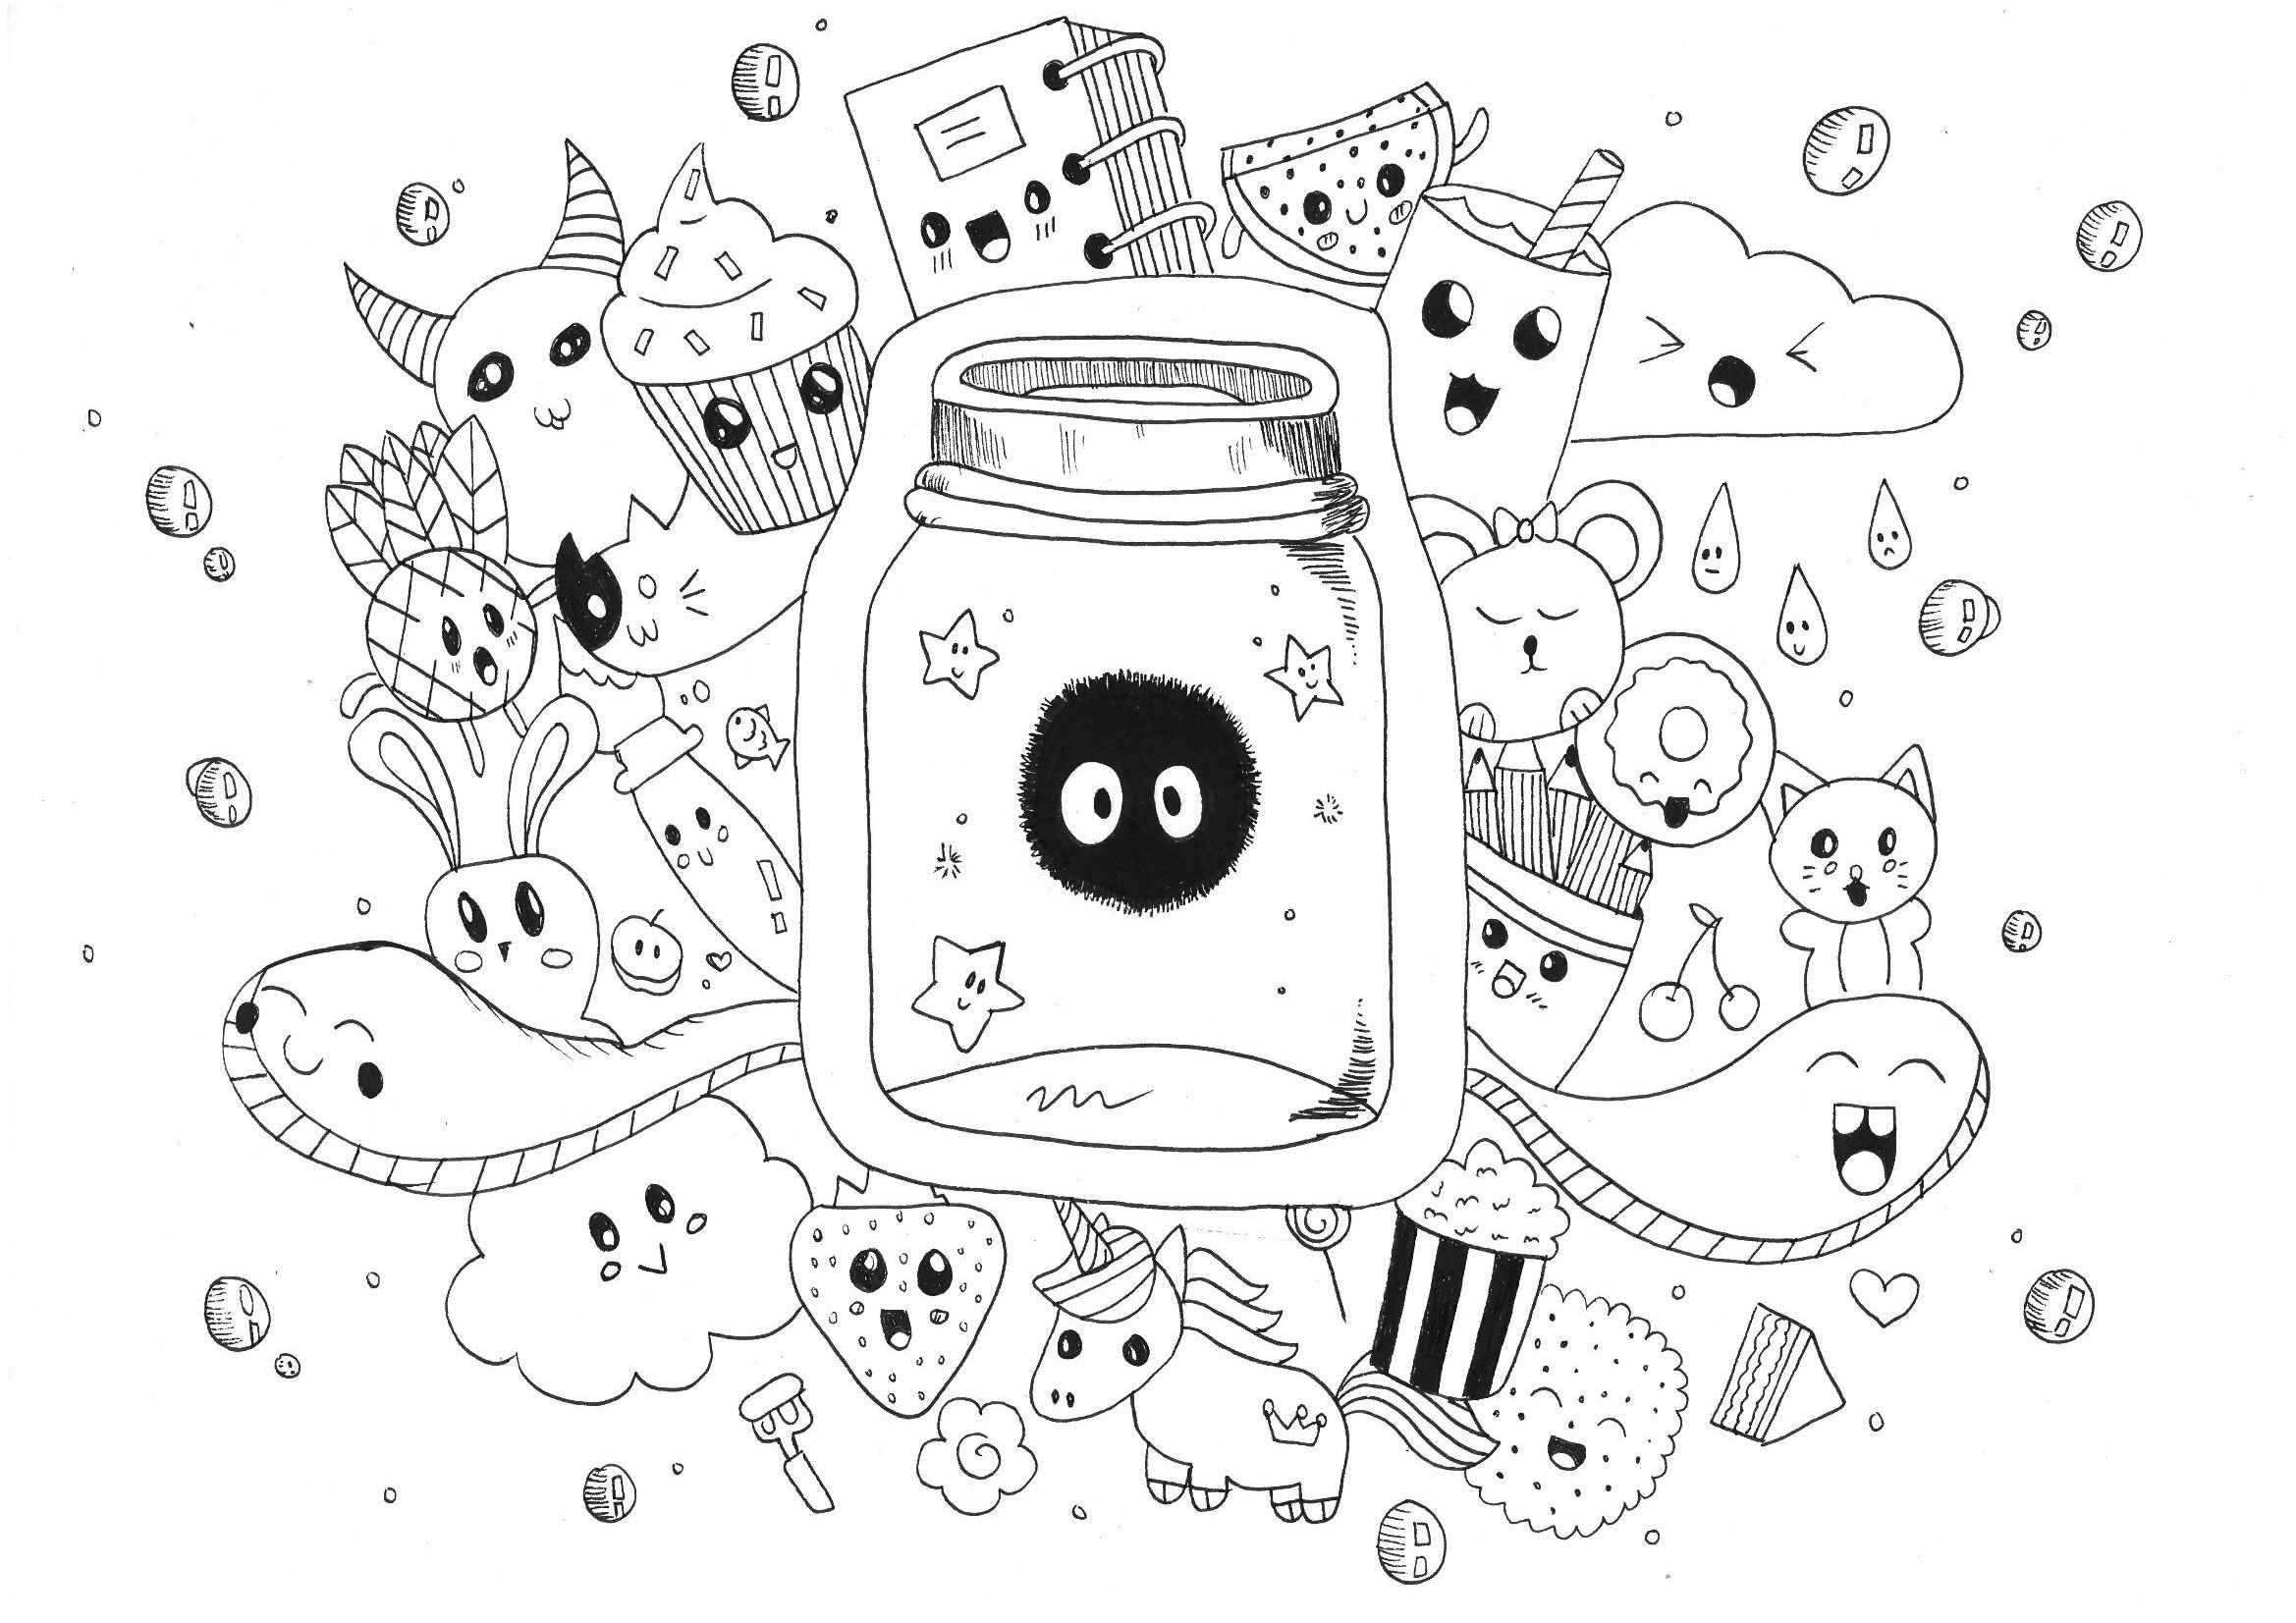 Kawaii Doodle Rachel Rachel Coloring Pages For Adults Just